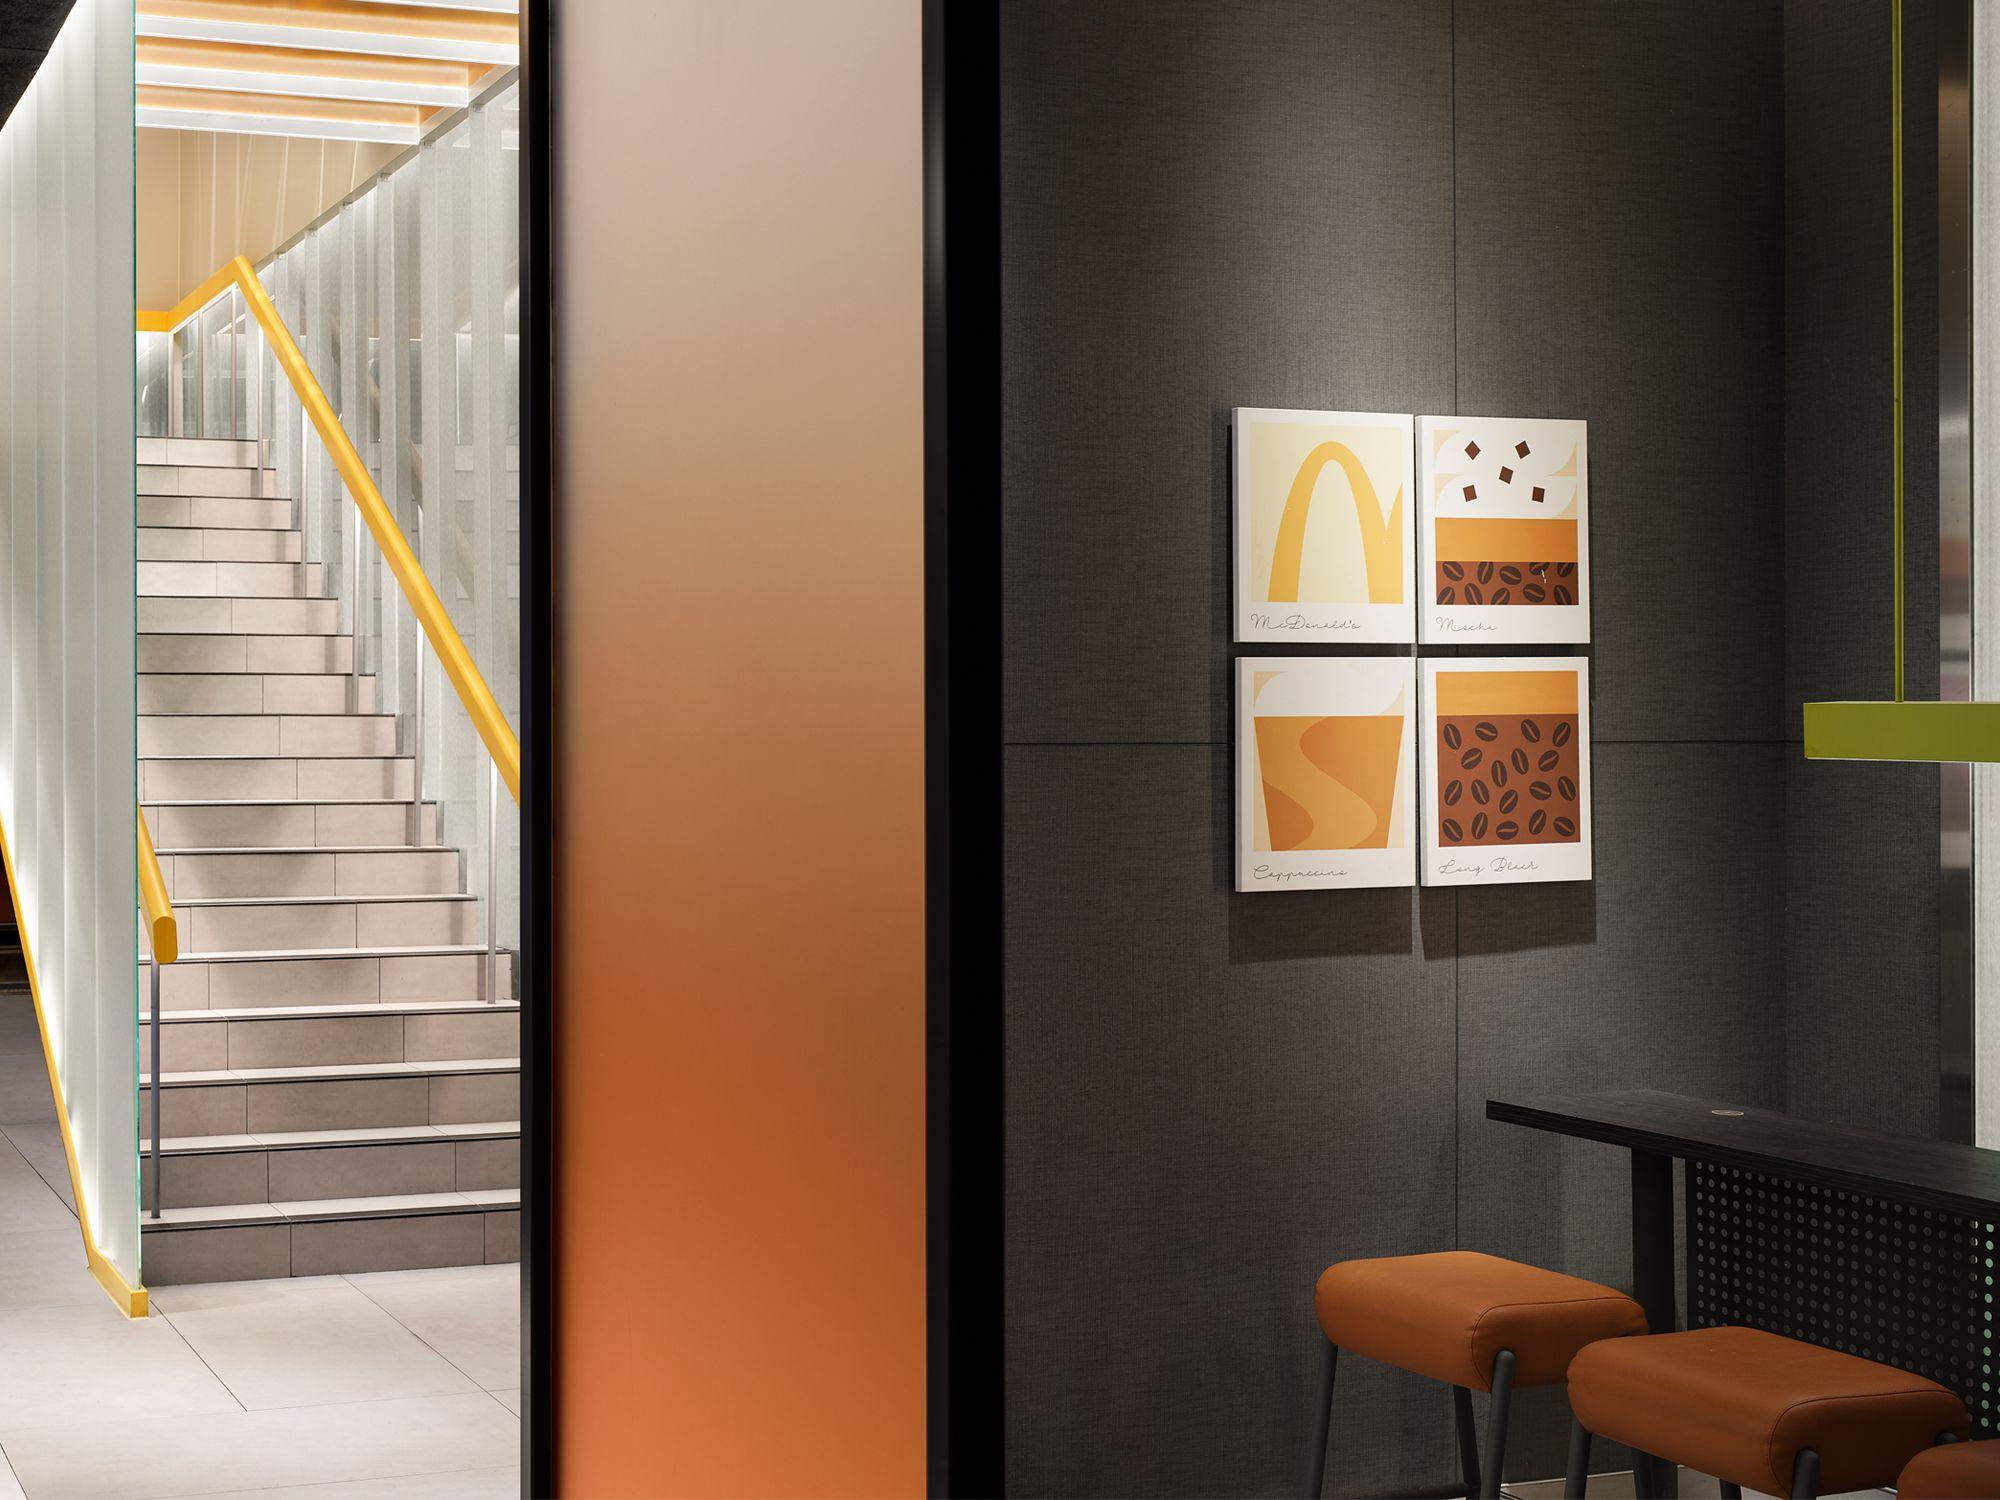 McDonald's Chengdu Cube flagship restaurant, designed by Steve Leung